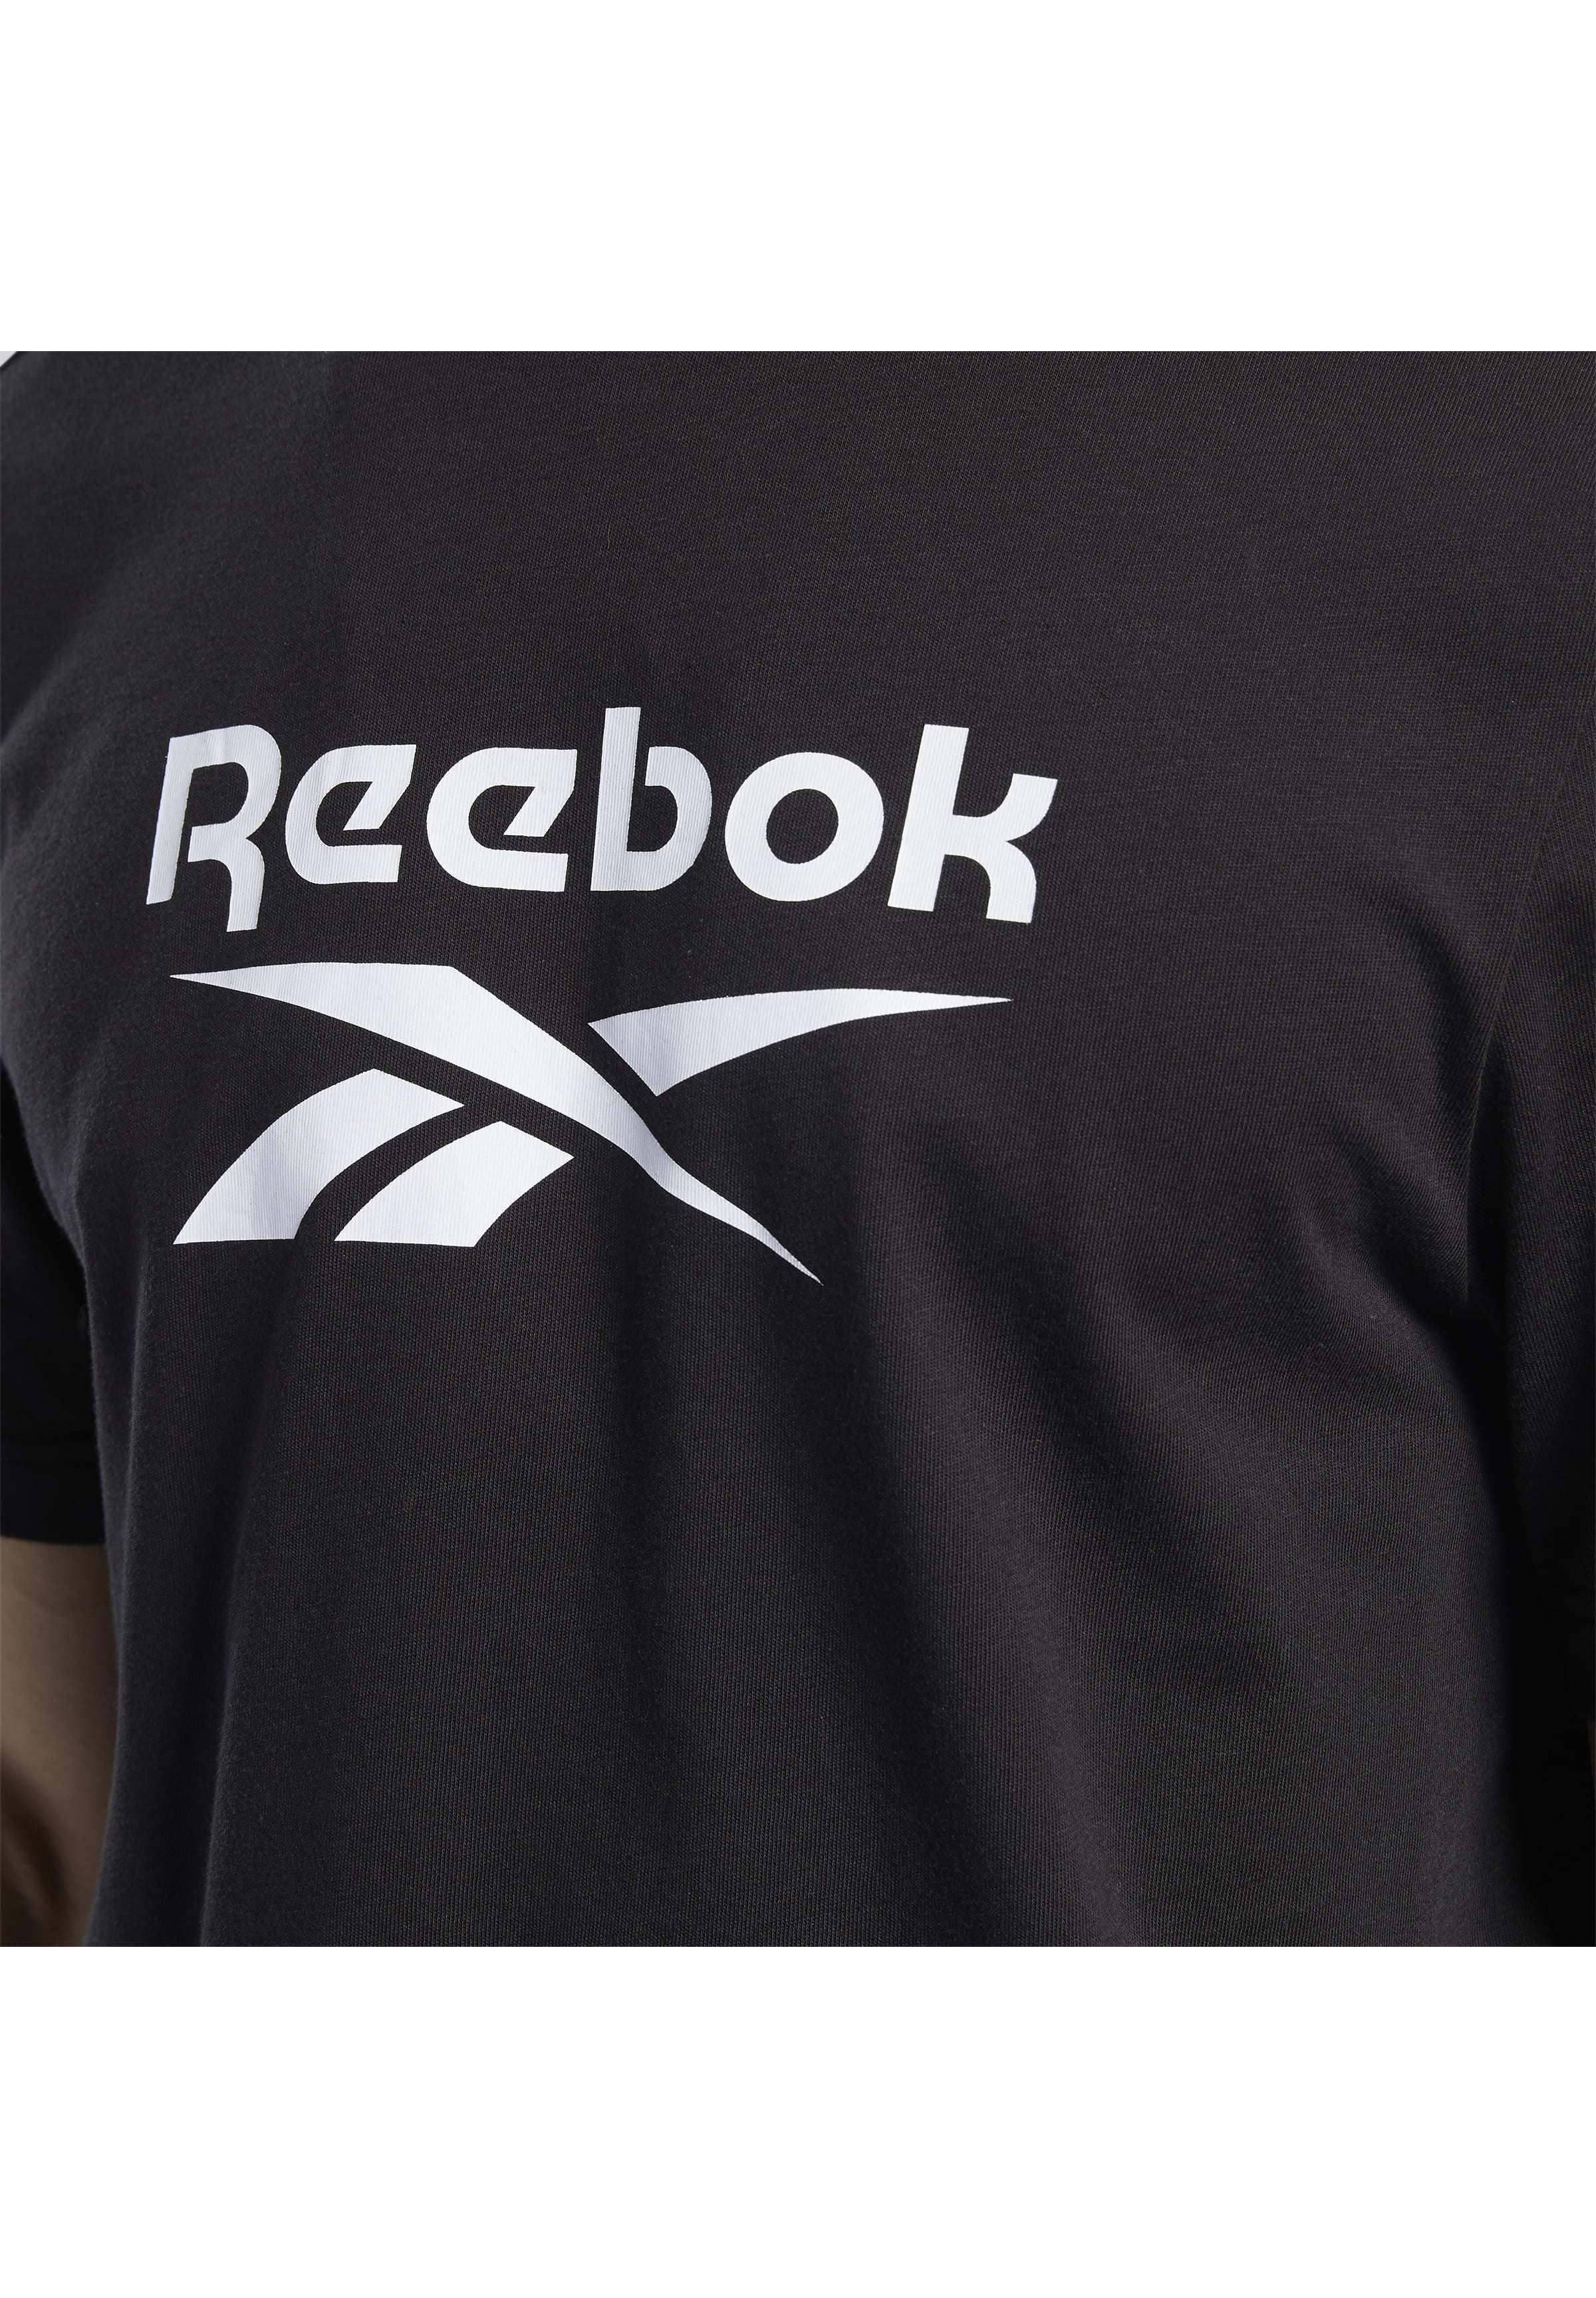 Reebok Classic Classics Vector T-shirt - T-shirts Med Print Black/svart